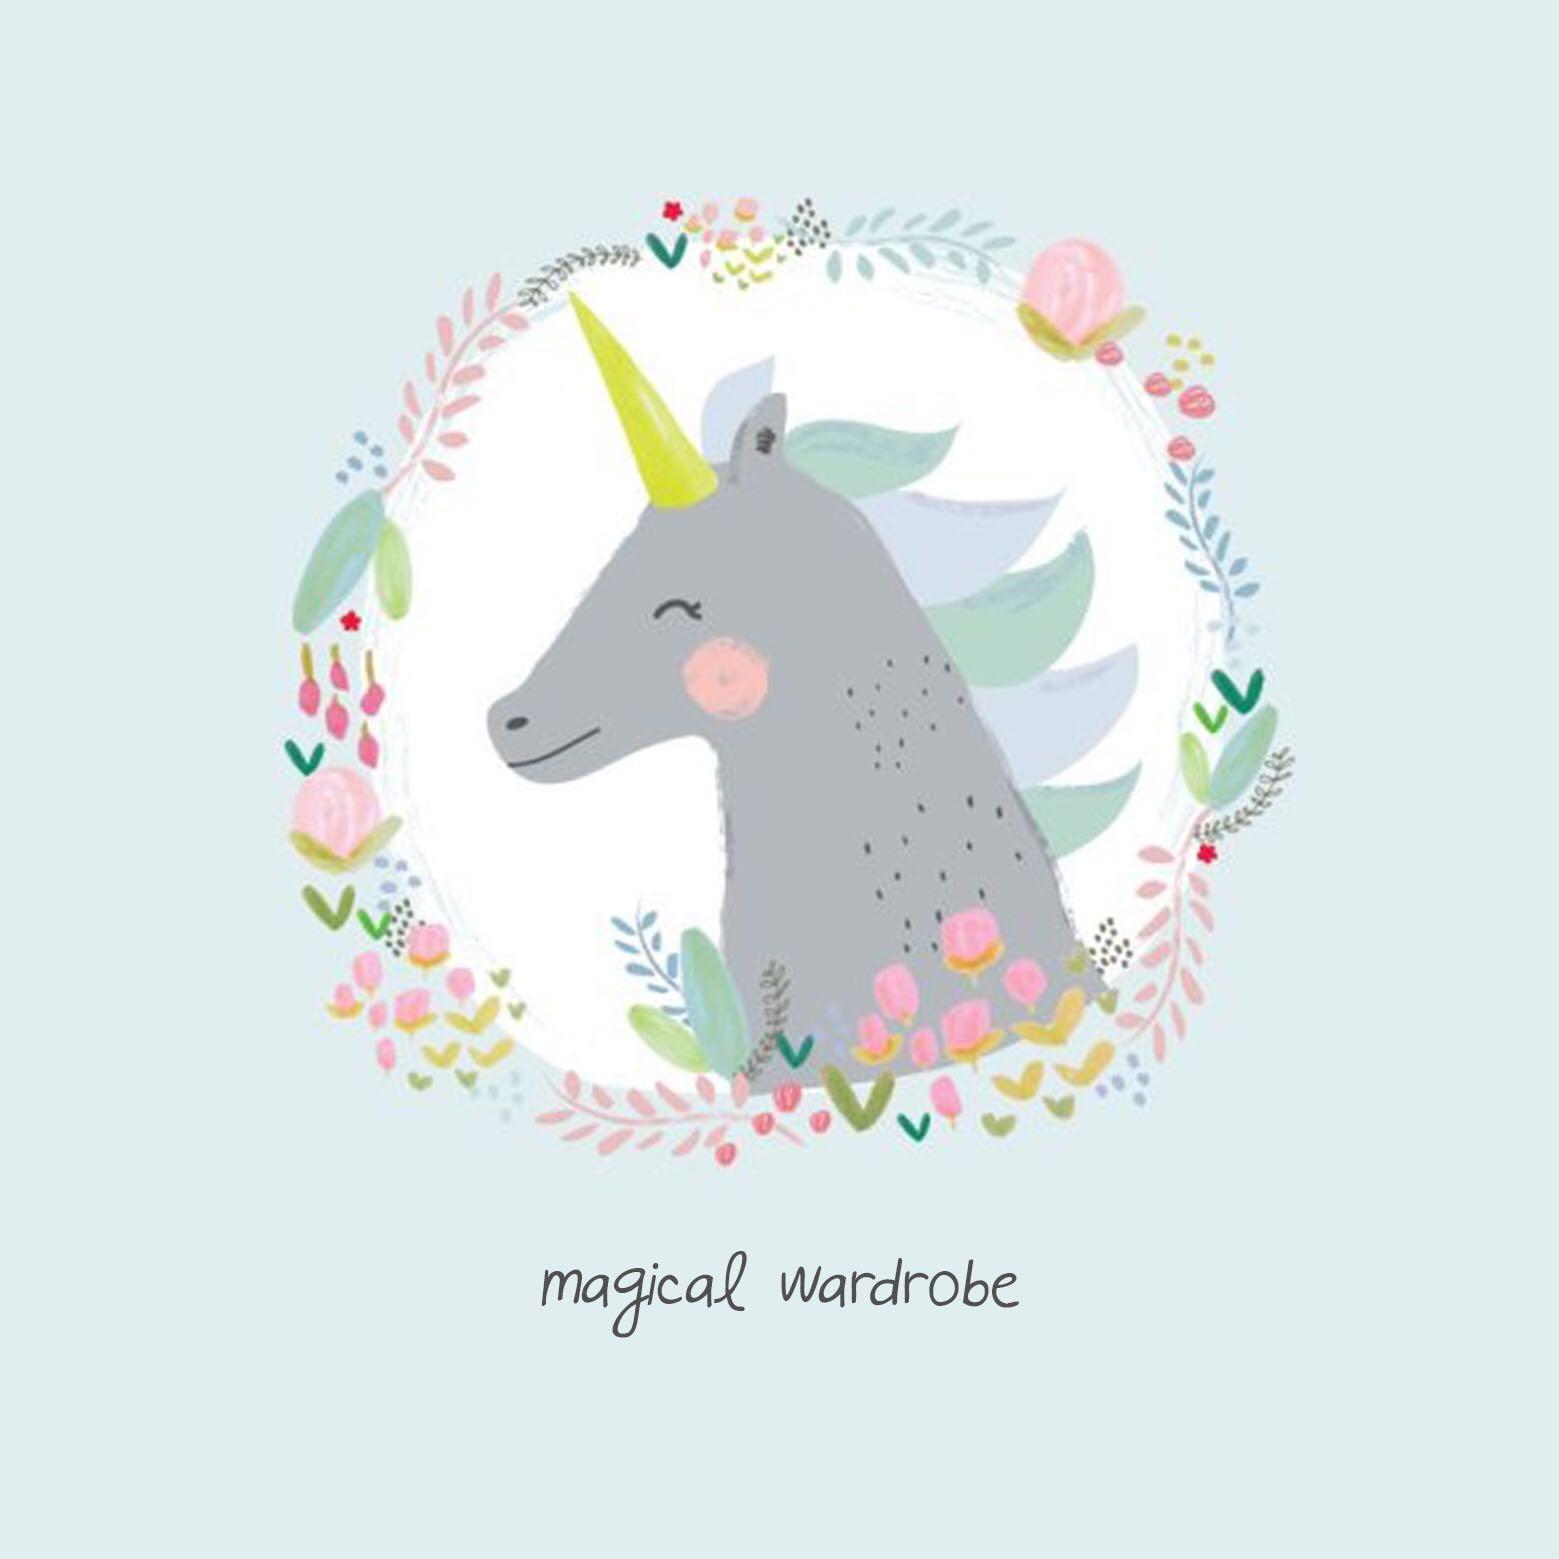 magicalwardrobe